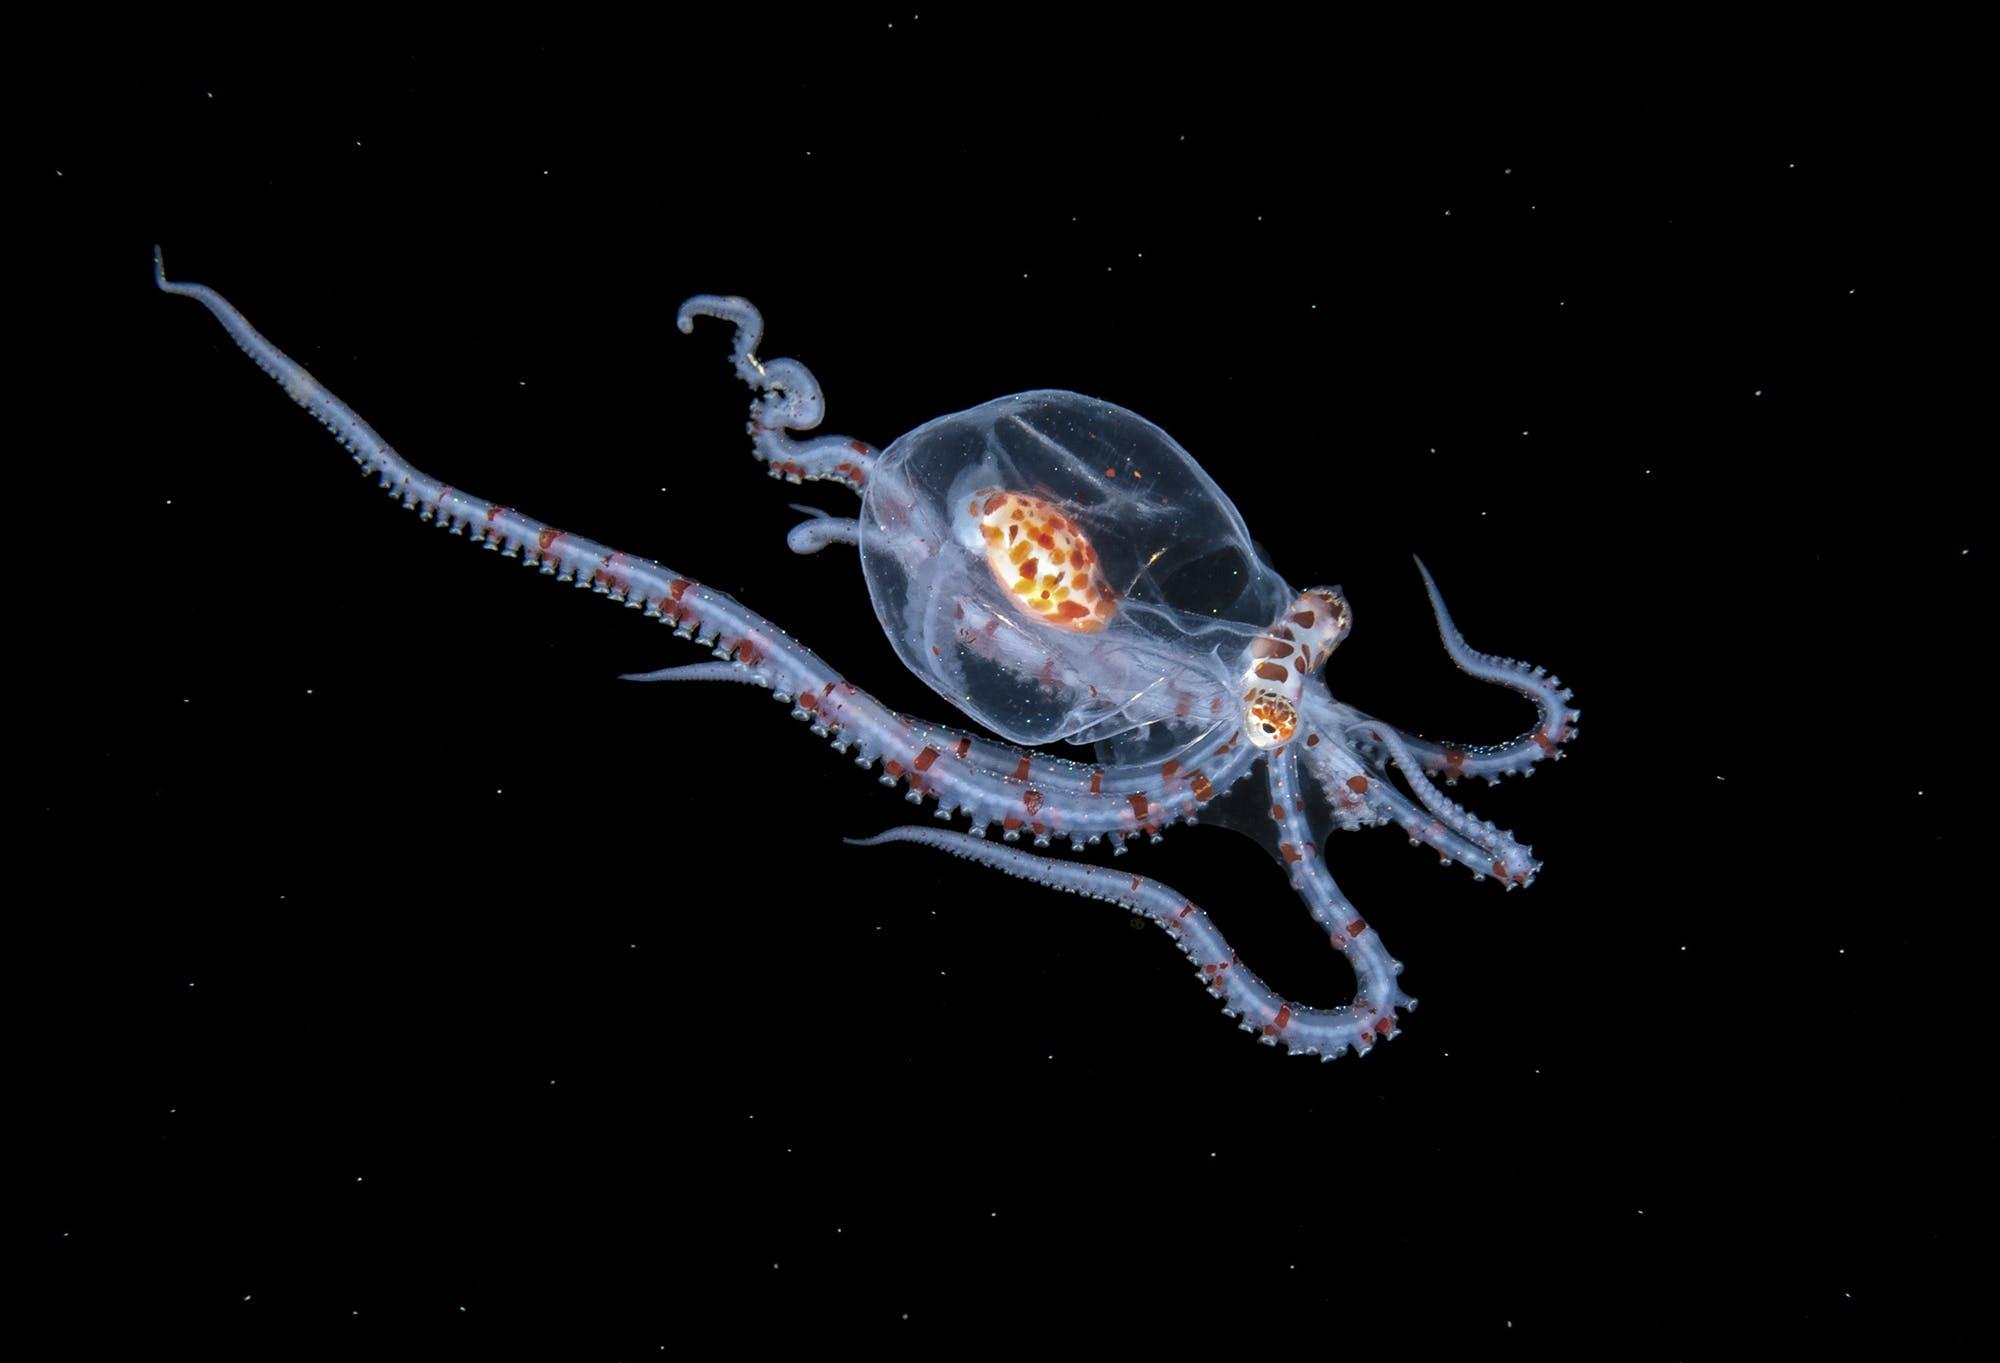 Steven Kovacs: Atlantic Ocean's Stunning Diversity